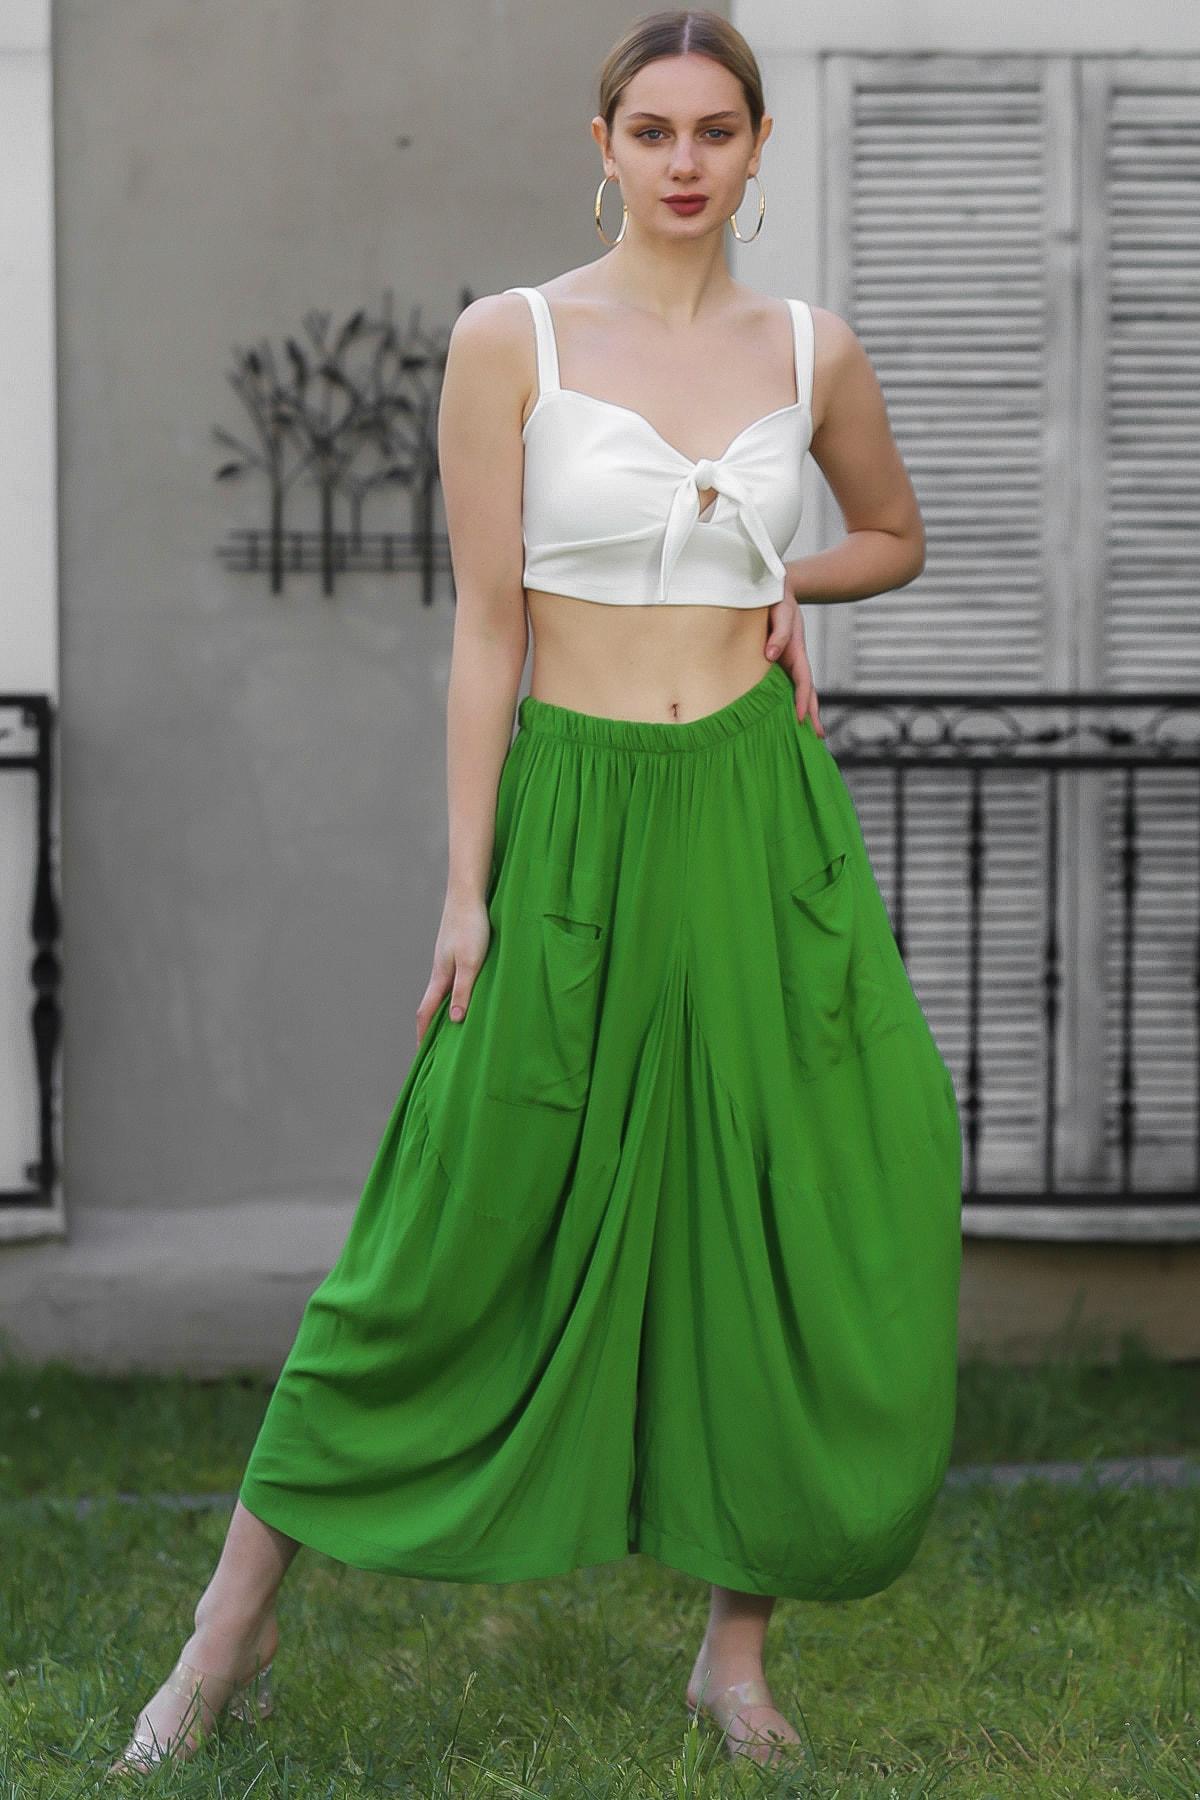 Chiccy Kadın Yeşil Özel Tasarım Cep Detaylı Salaş Dokuma Pantolon M10060000PN98842